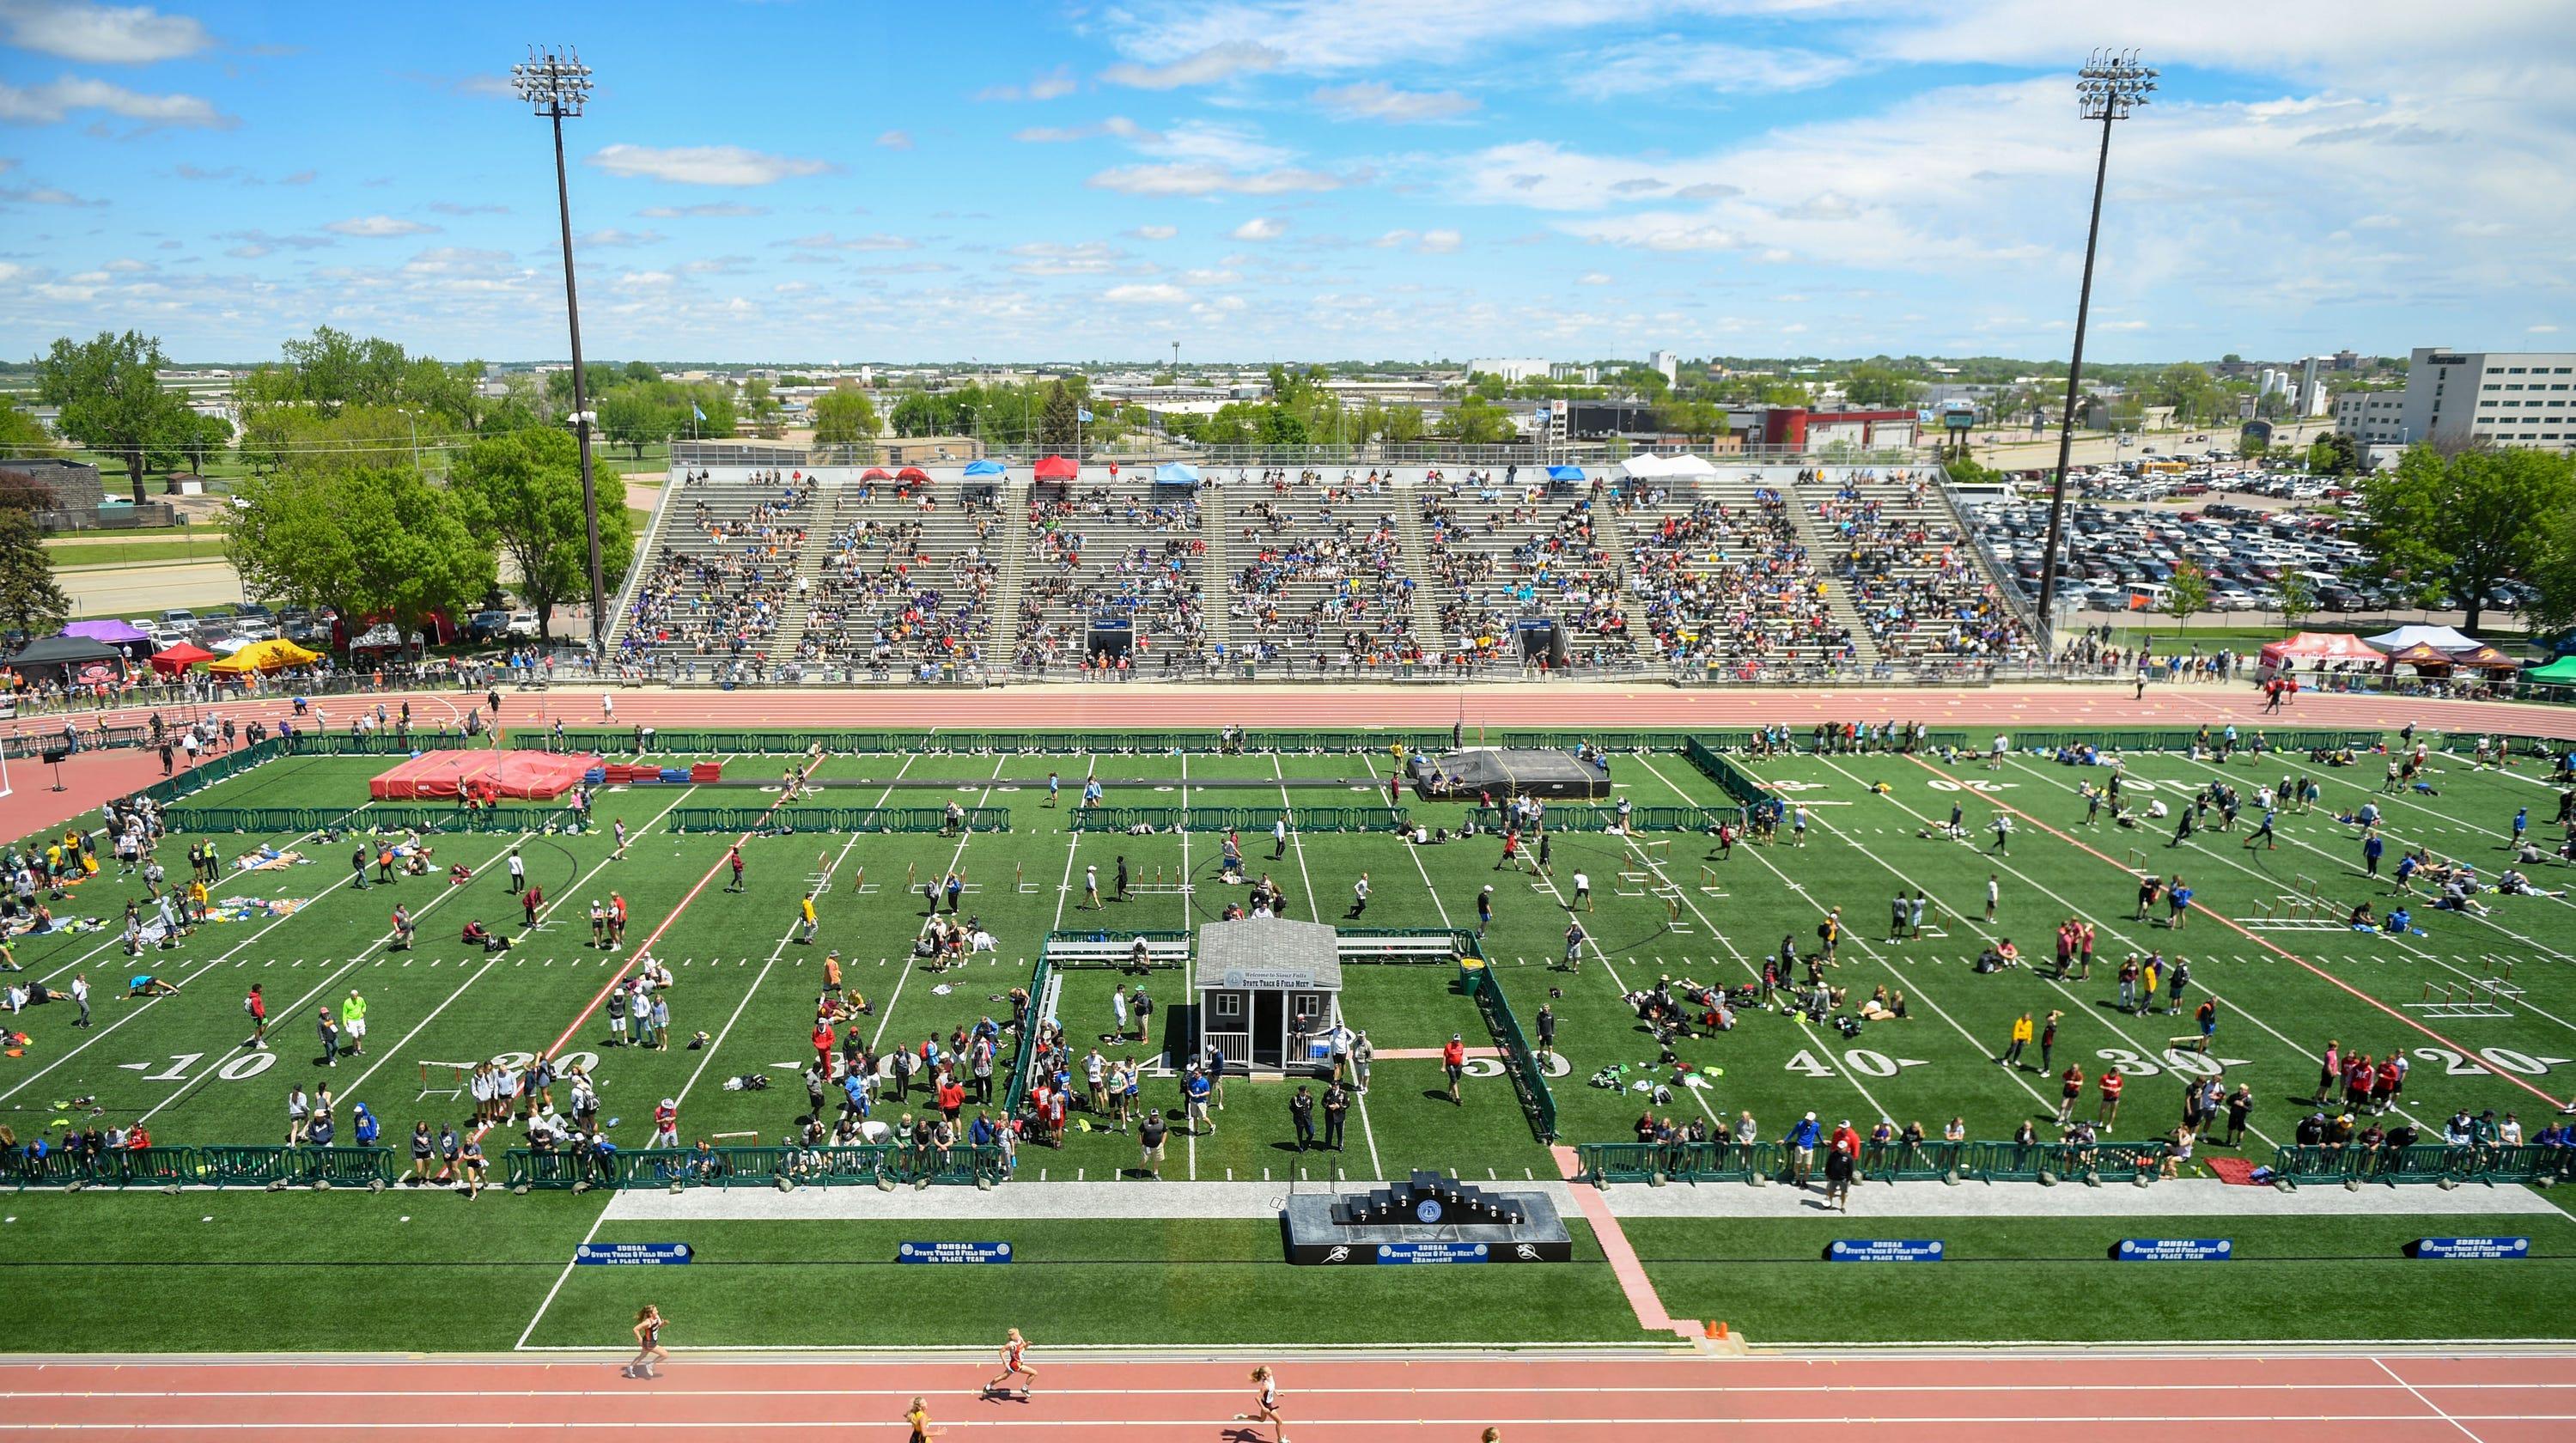 2019 South Dakota High School State Track and Field Meet